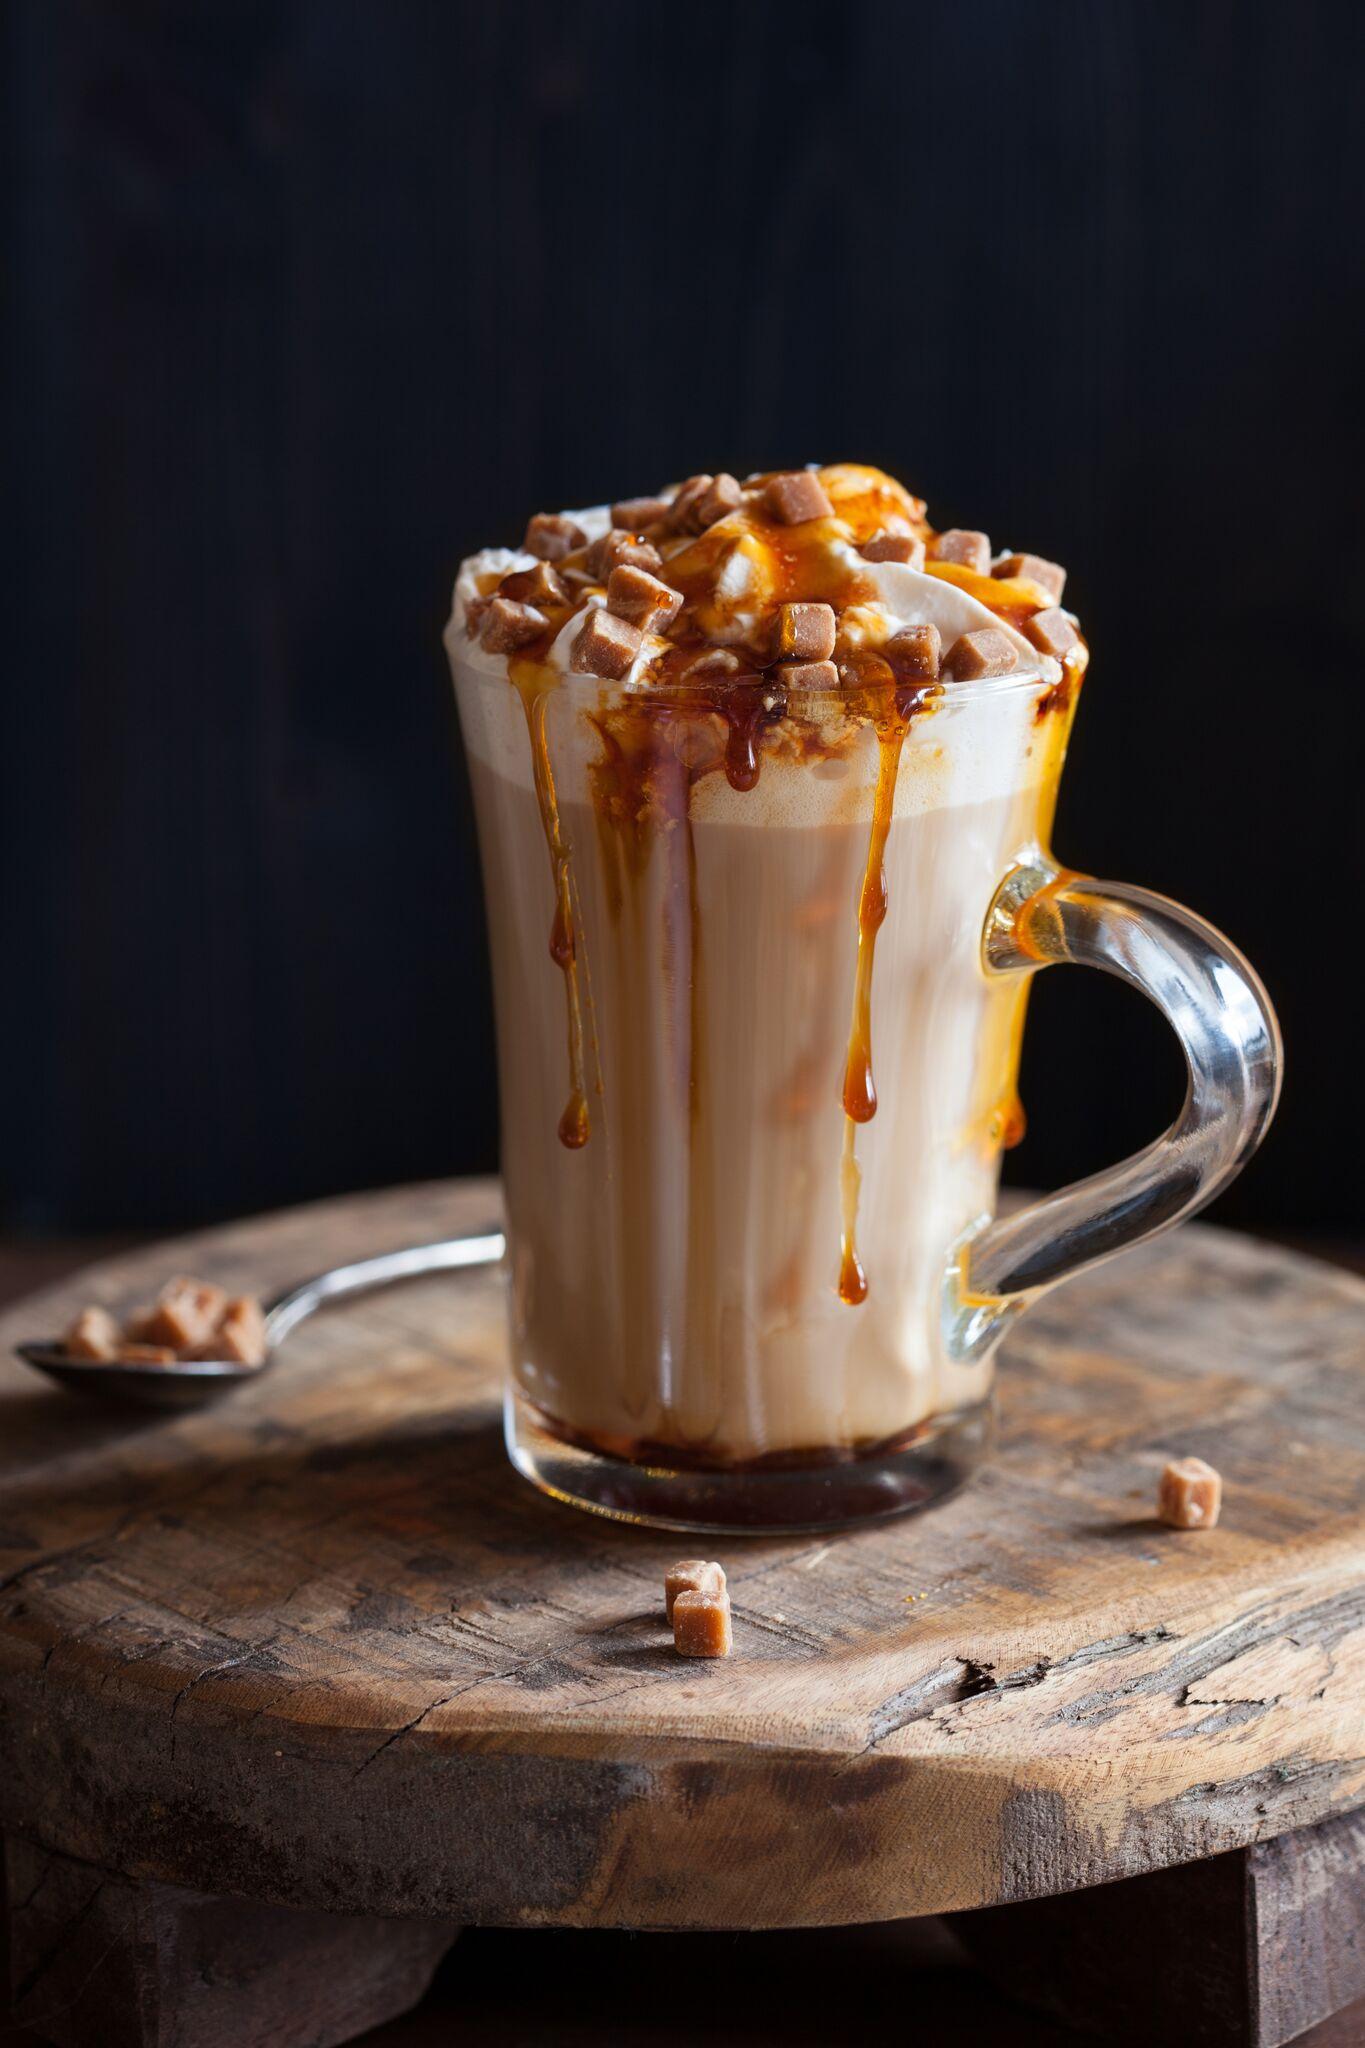 Caramel Coffee Ice Crean